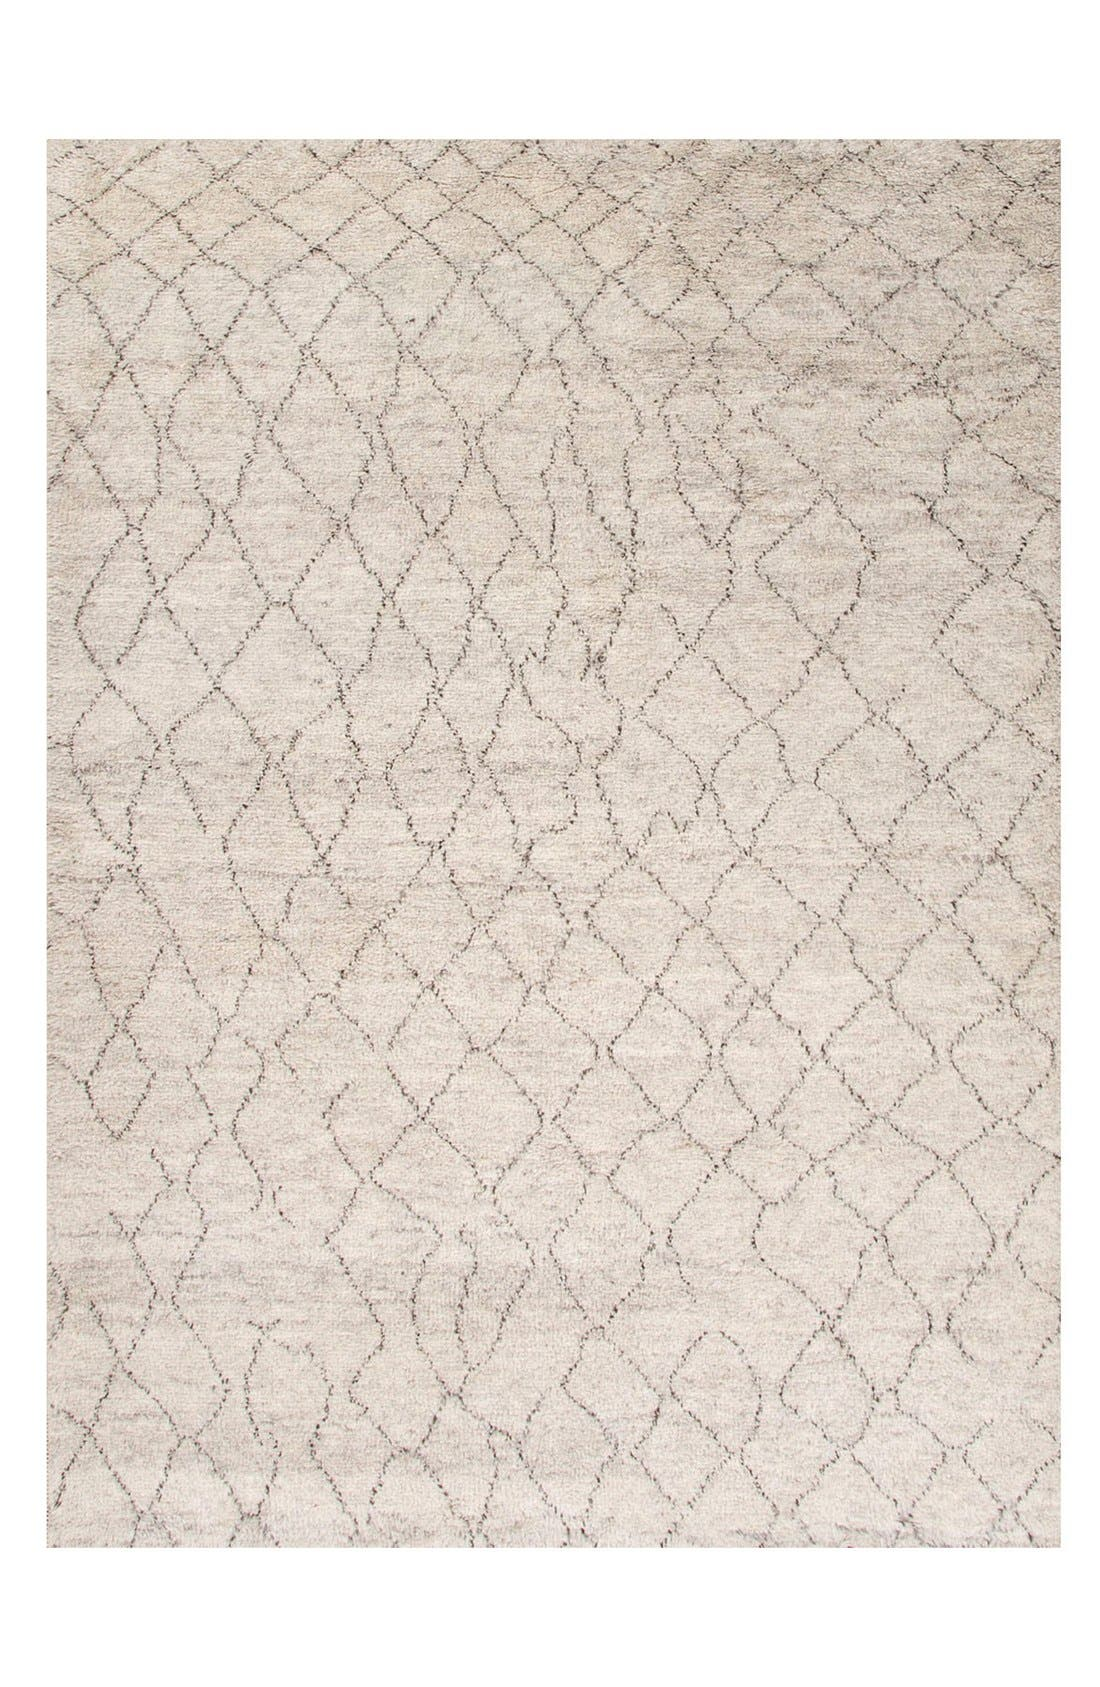 'Zola Irregular Lines' Wool Rug,                             Main thumbnail 1, color,                             IVORY/ BROWN